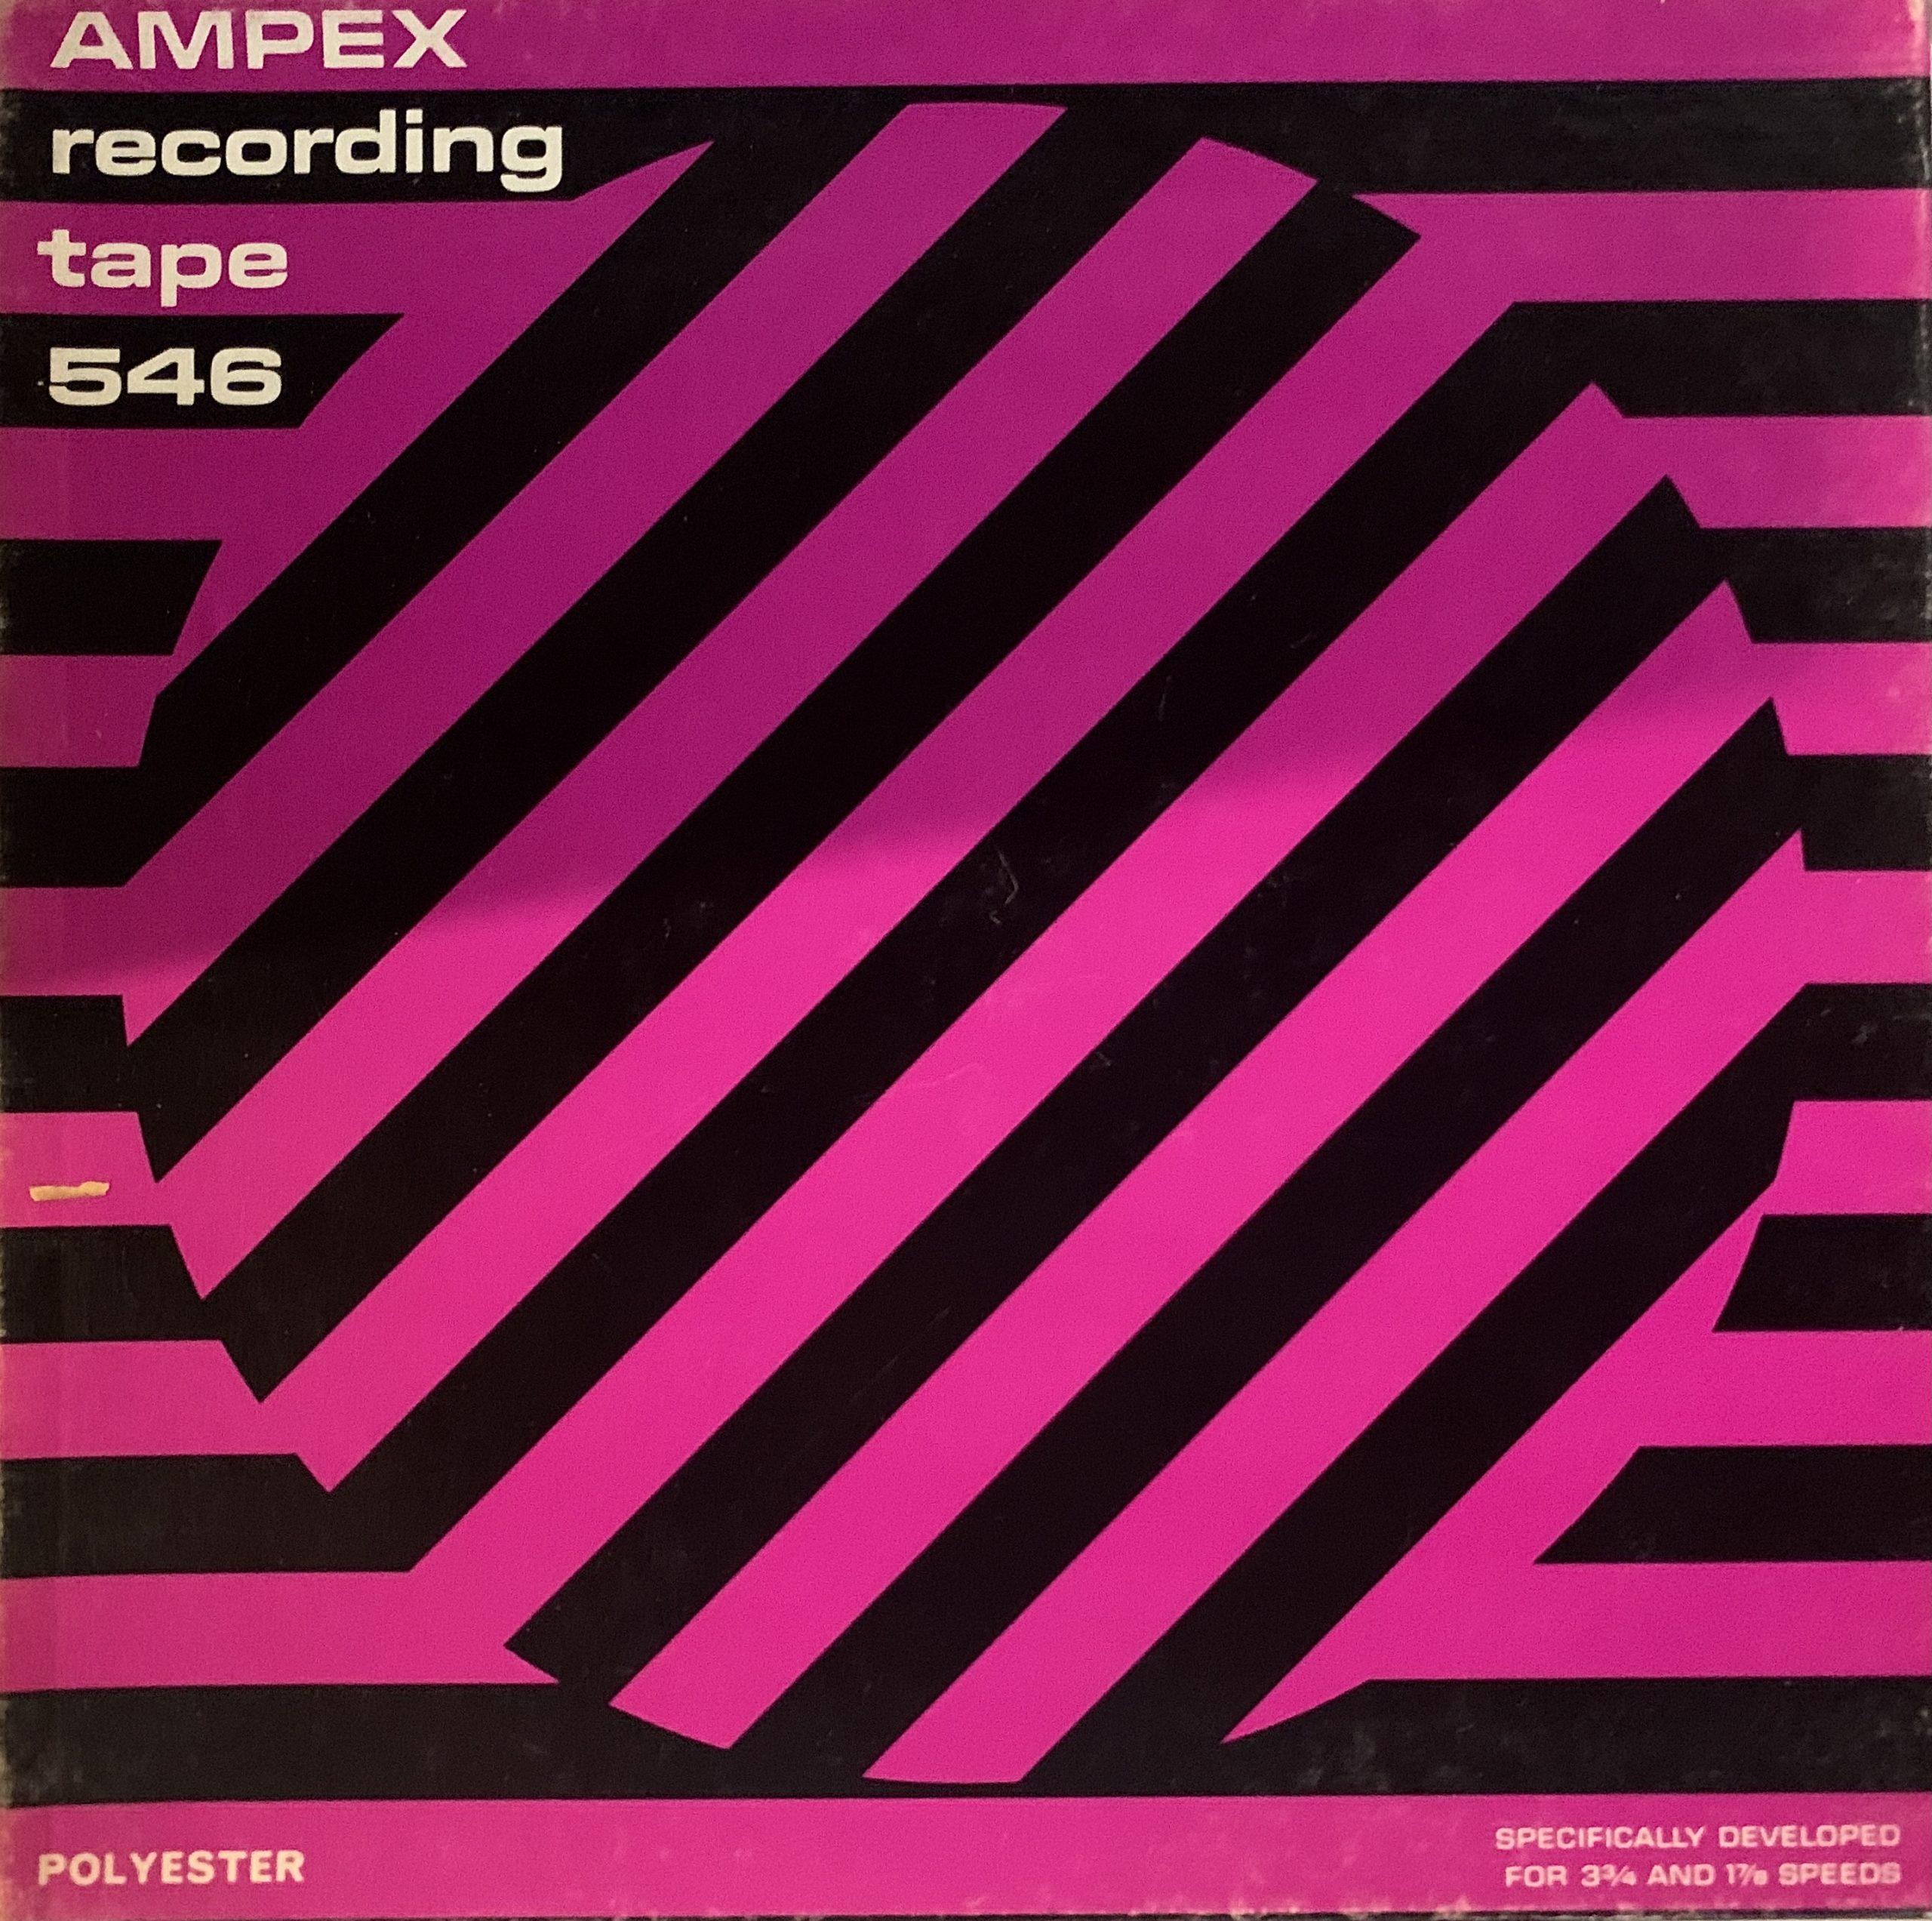 Ampex-546-Reel-Tape-Box-1970s